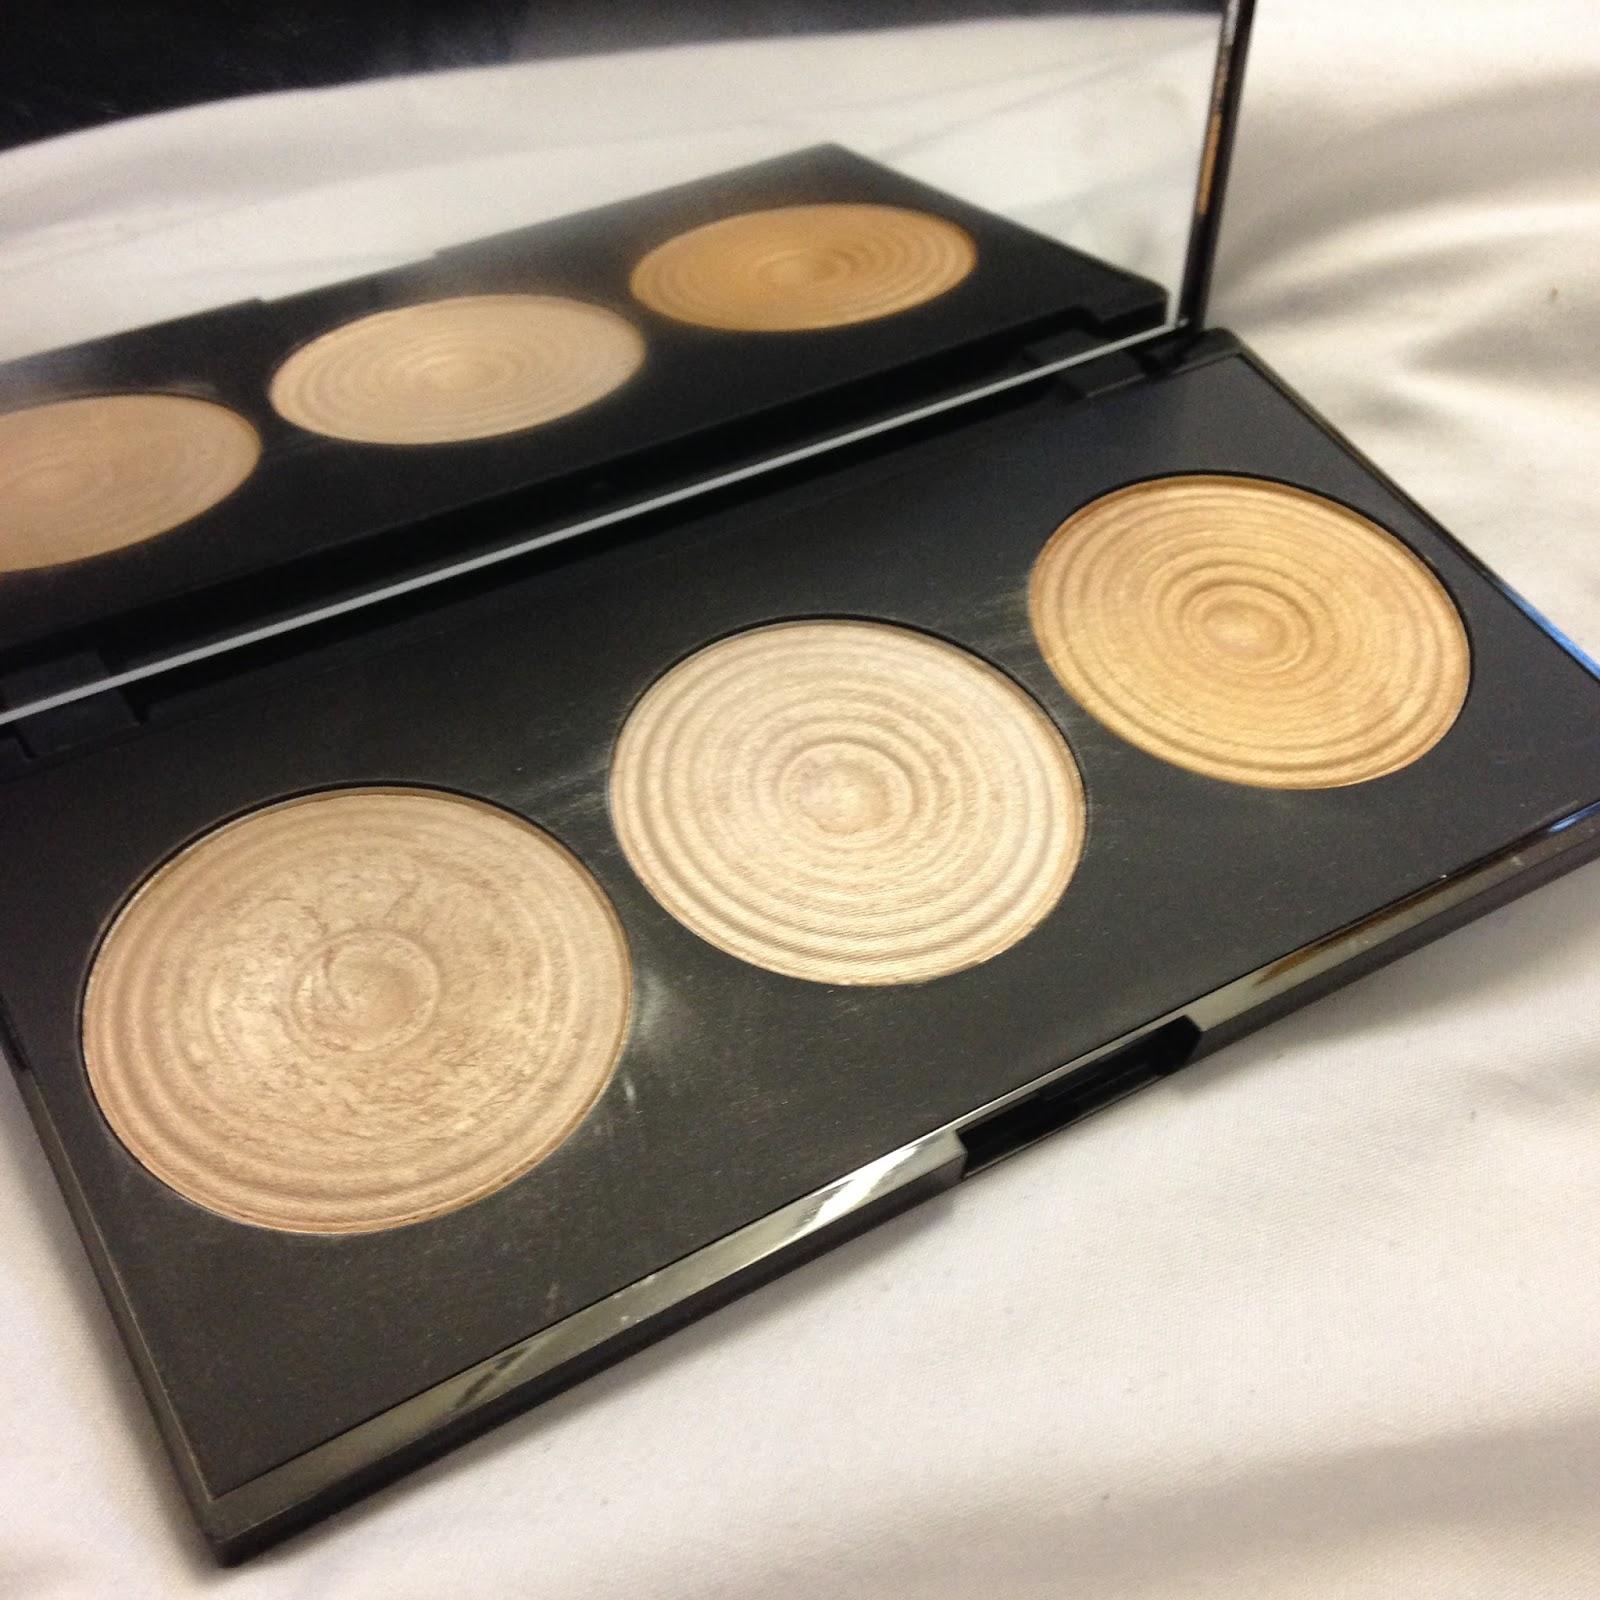 Review - Make Up Revolution Radiance Palette.